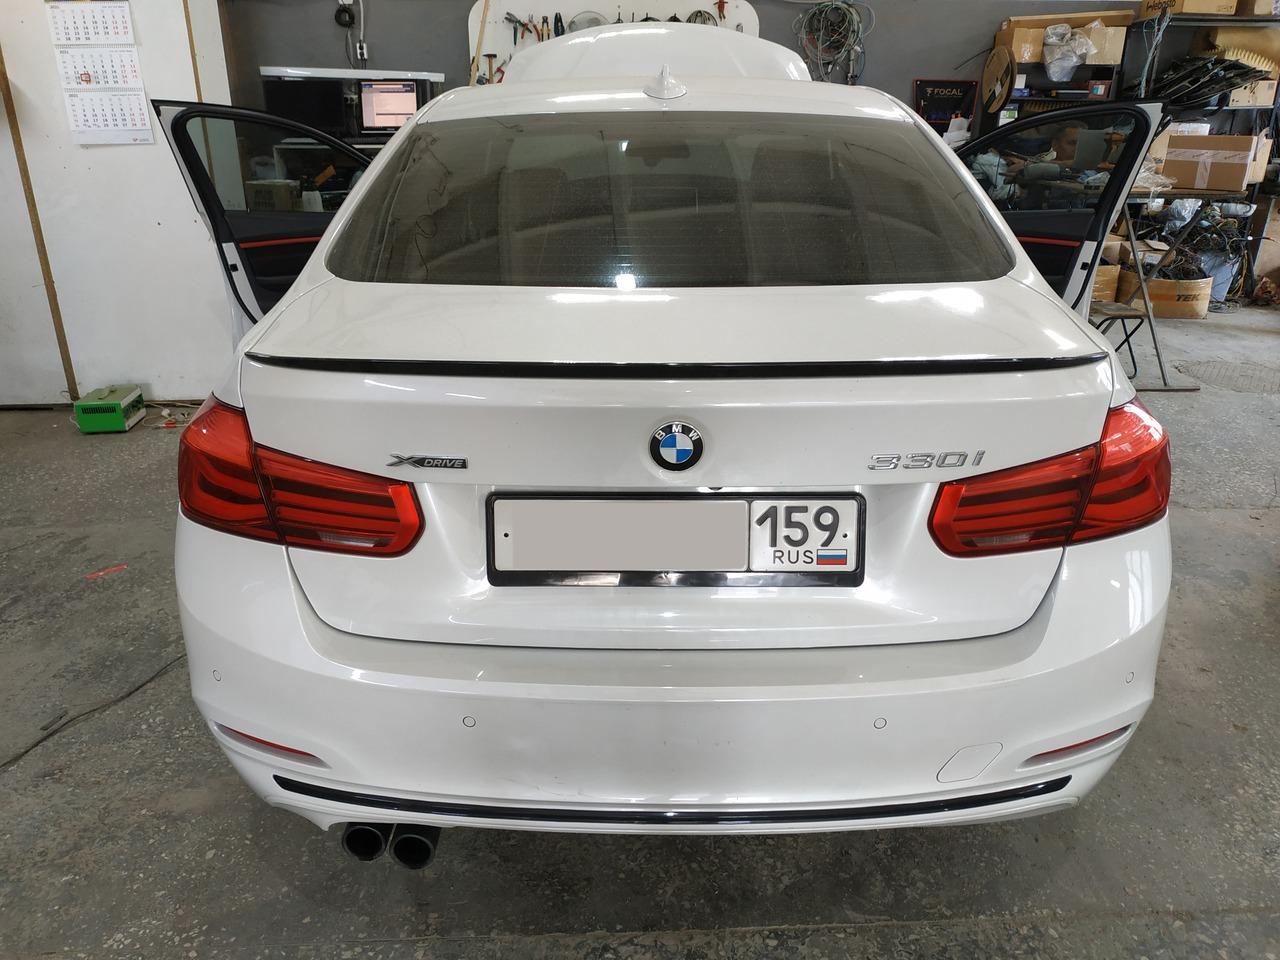 BMW F30 330iX, вид сзади